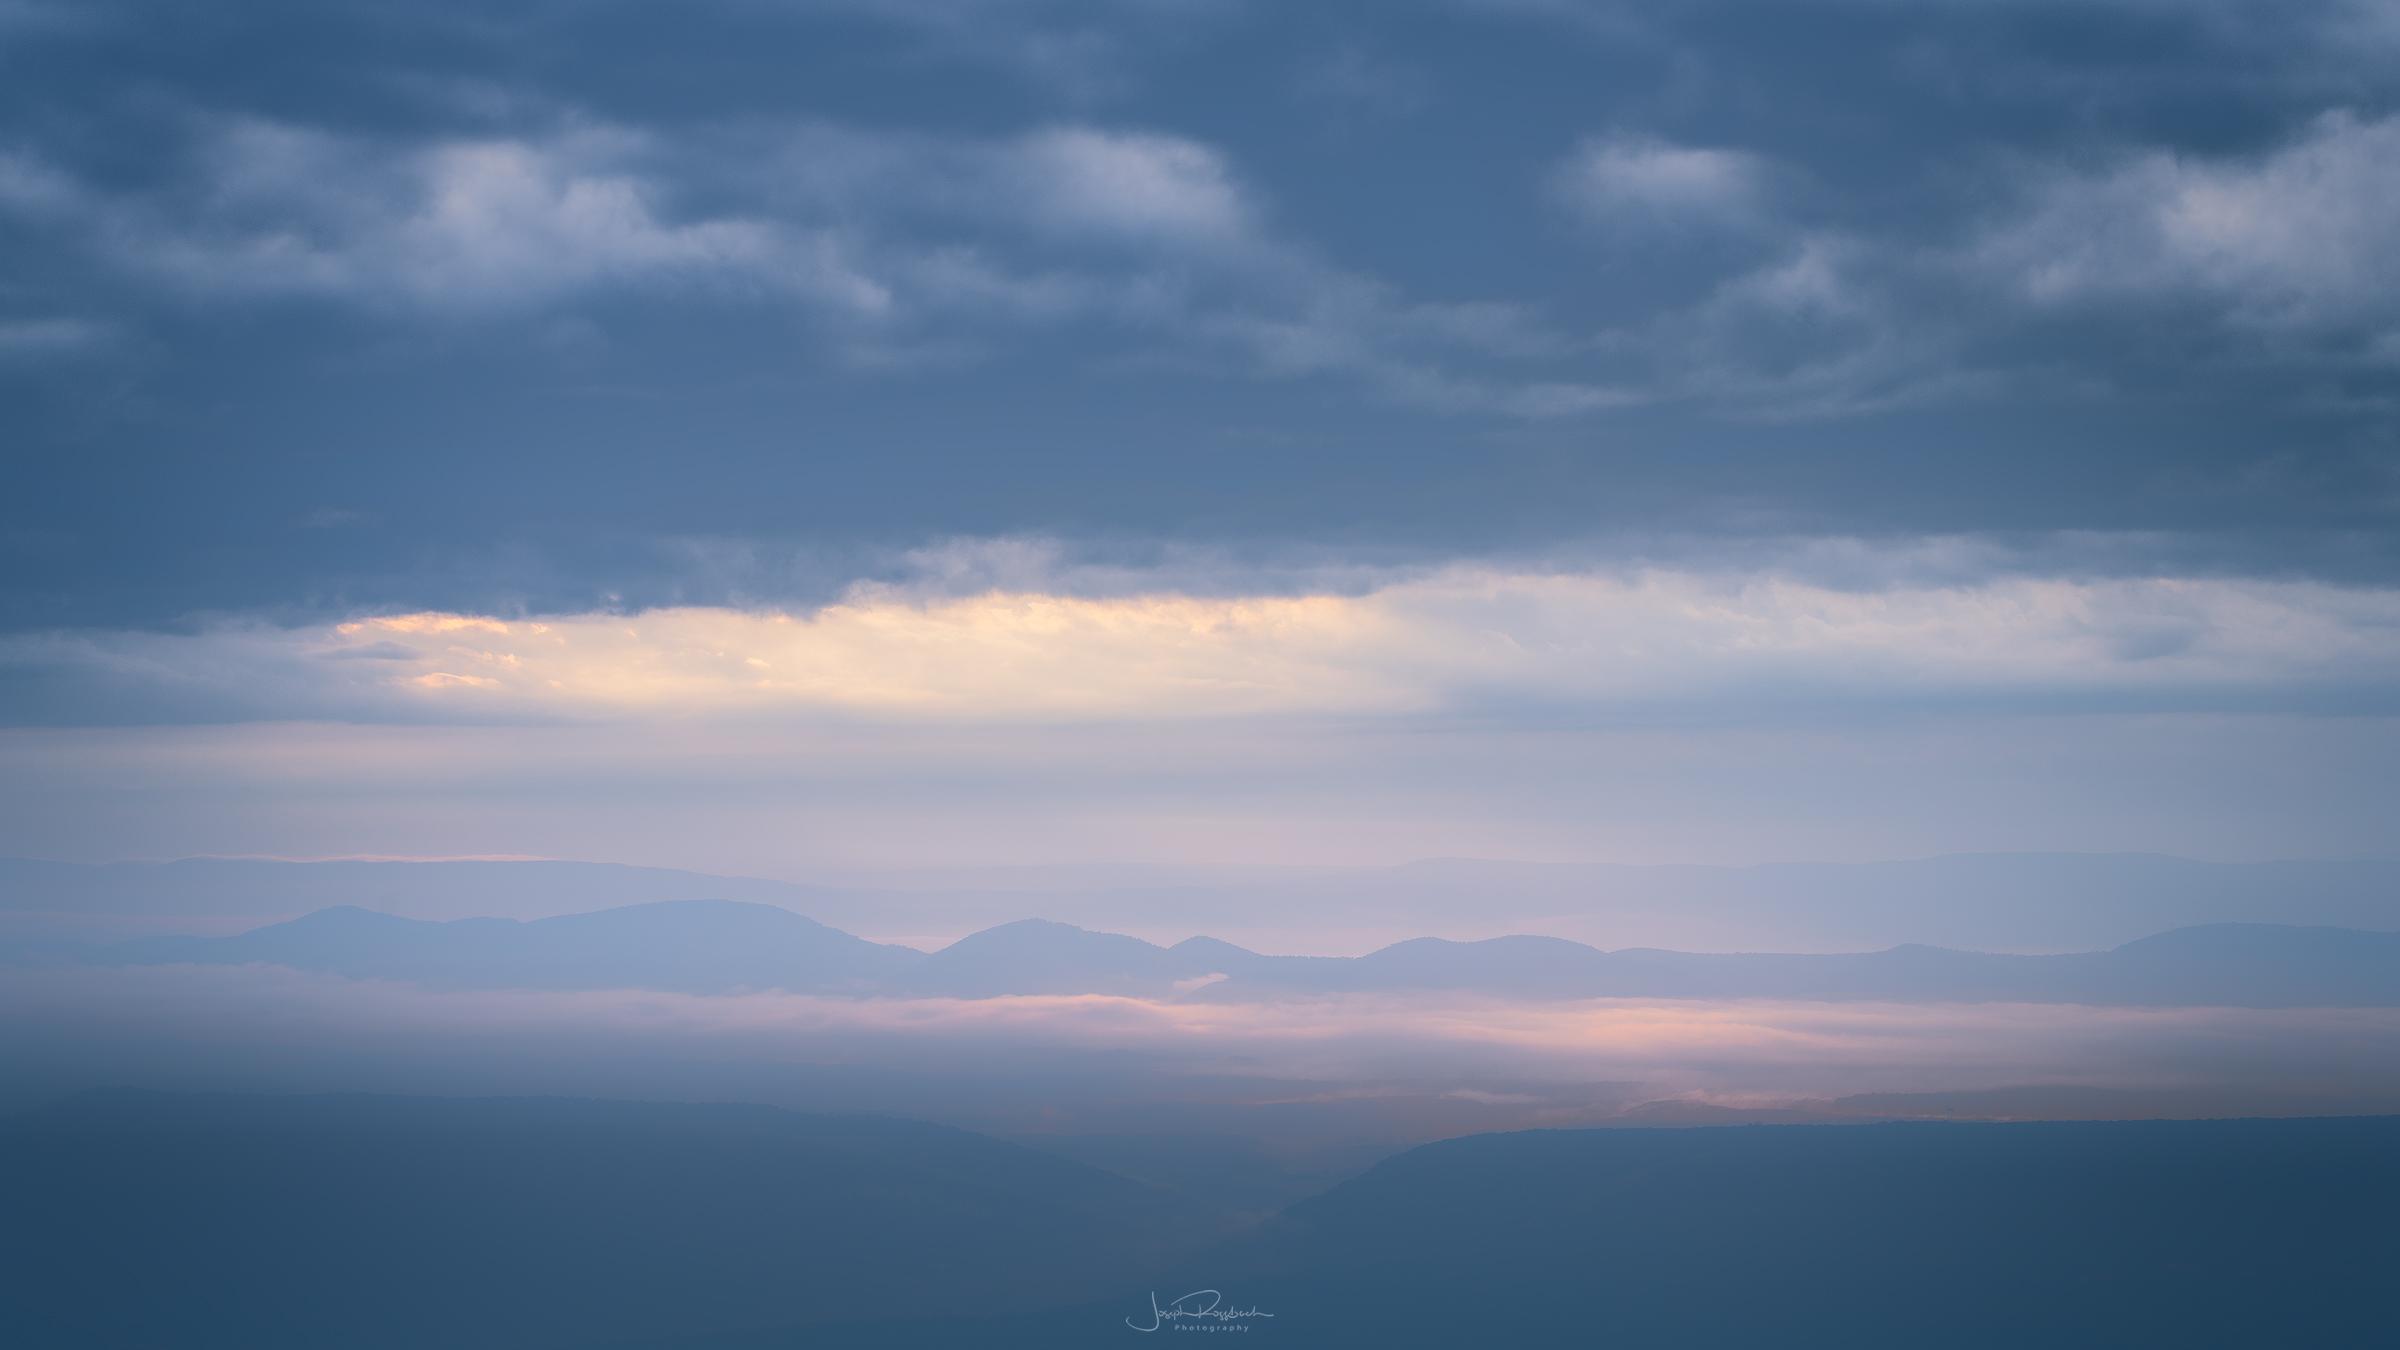 Sunrise from Bear Rocks, Dolly Sods, West Virginia